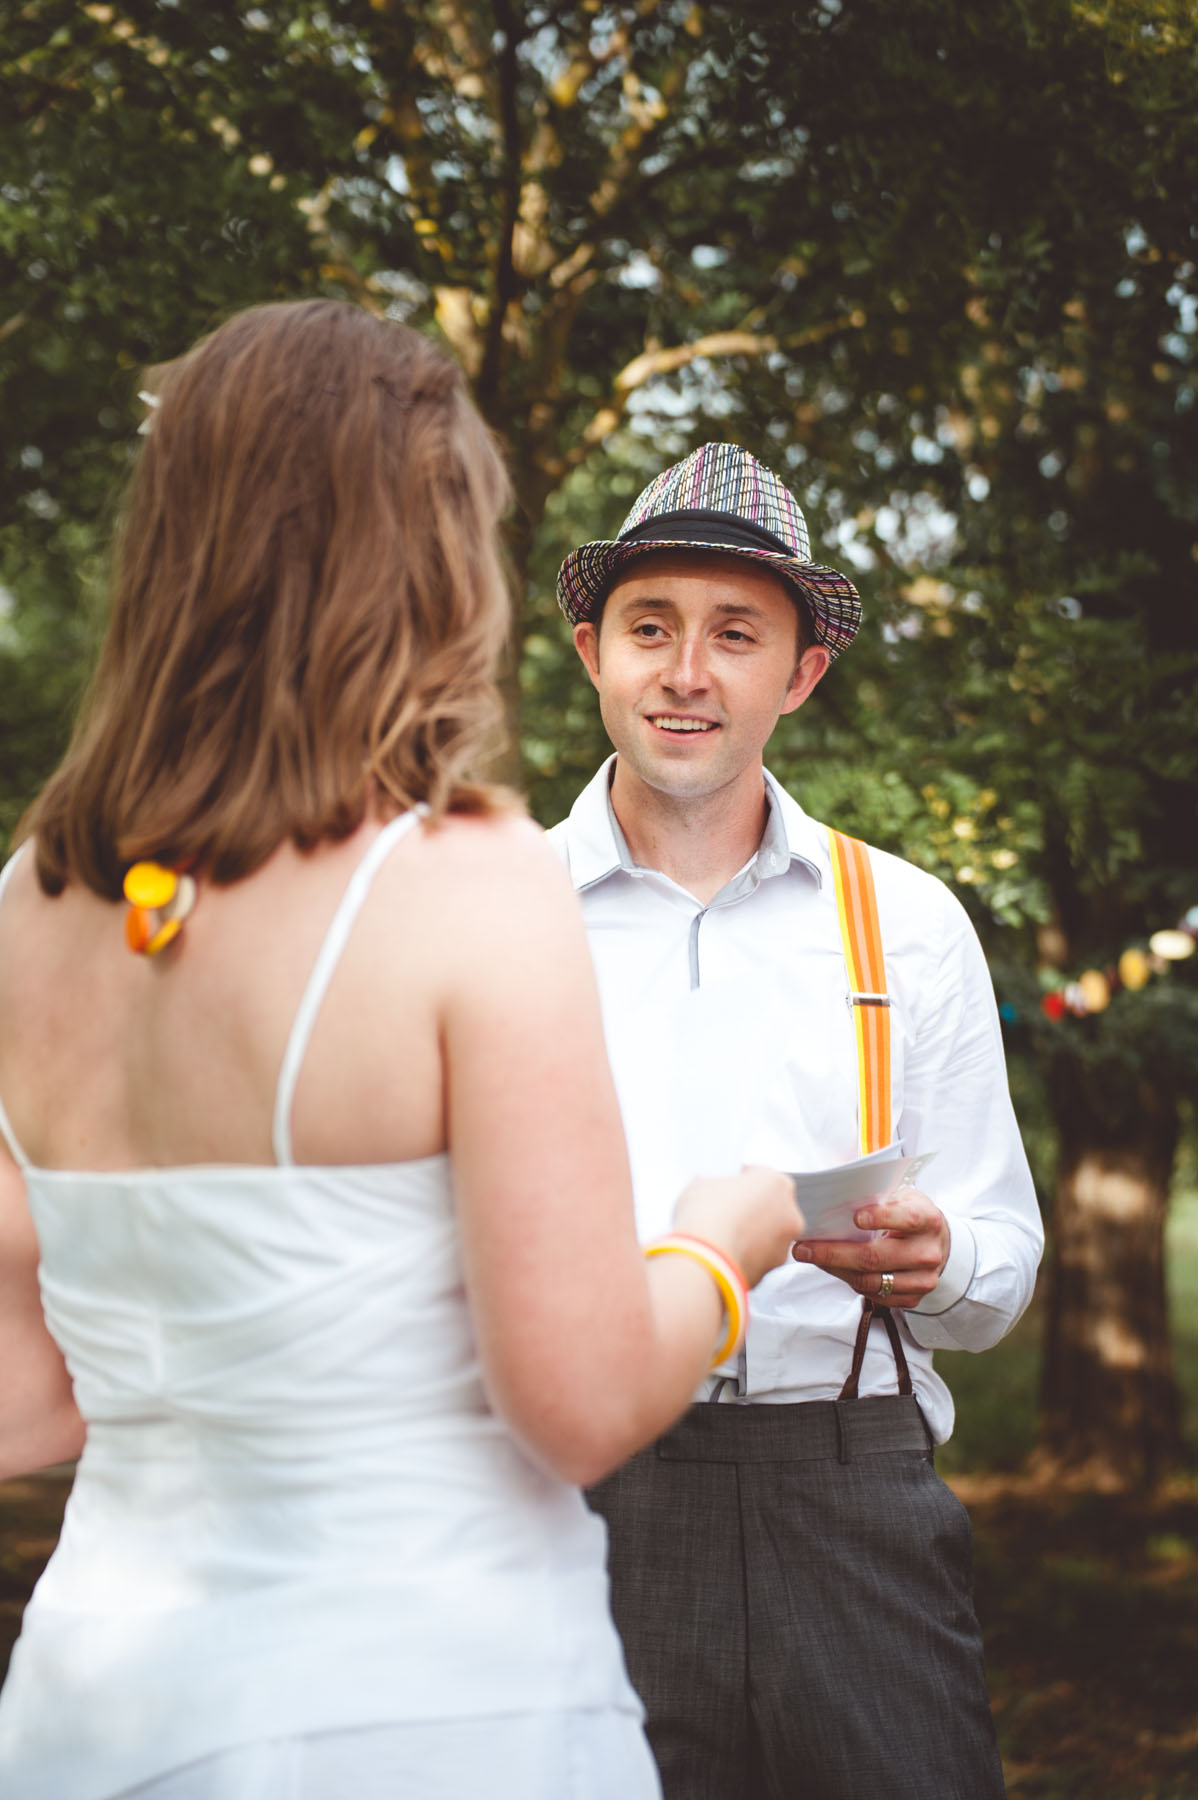 Photographe mariage original toulouse montpellier - M et S - Mademoiselle G Photographie (54)